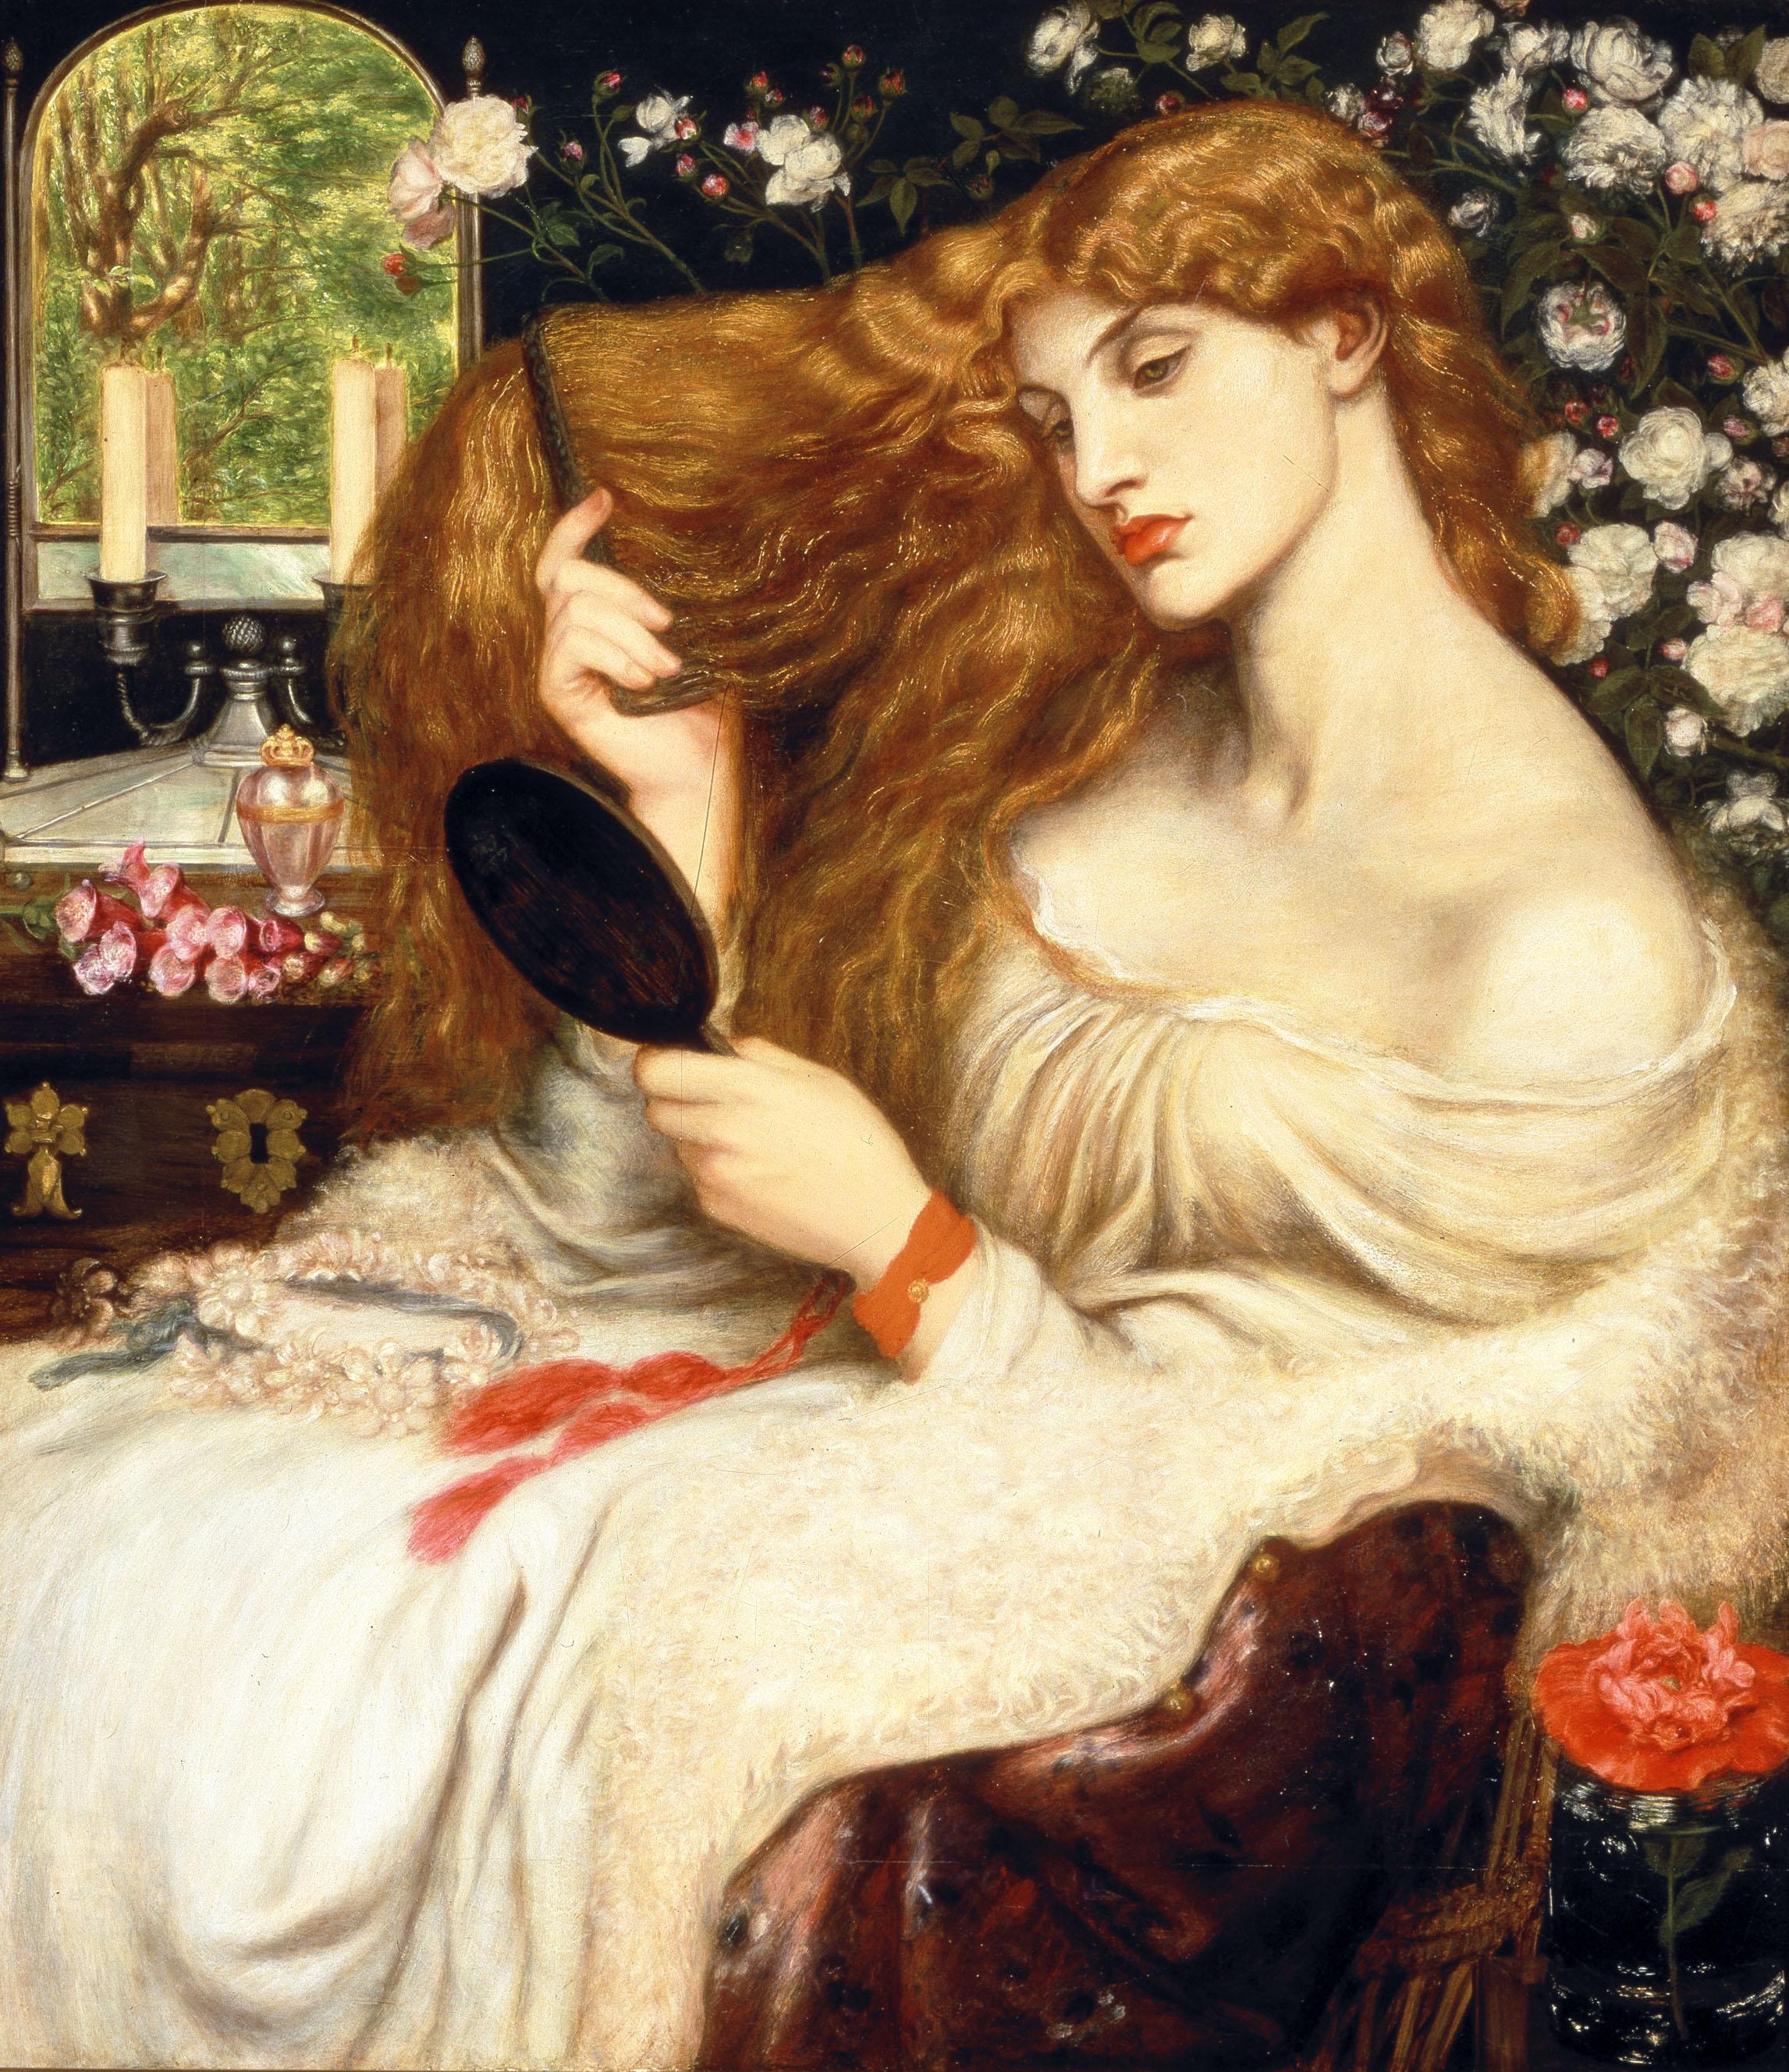 Image: Lady Lilith by pre-raphaelite Dante Gabriel Rossetti. Image credit: By Dante Gabriel Rossetti...